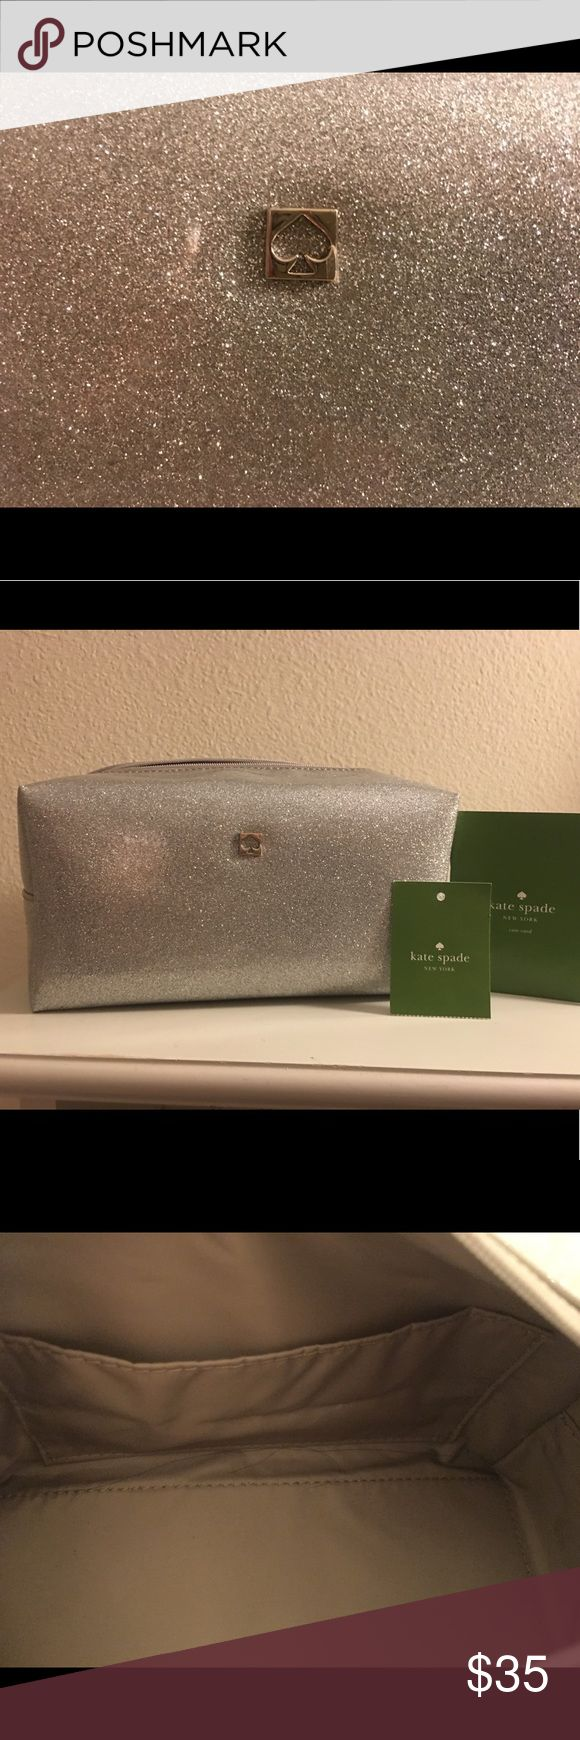 New! Kate Spade New York medium Cosmetic bag. Kate Spade Mavis Street medium Davie make up pouch - cosmetic bag in Silver. kate spade Bags Cosmetic Bags & Cases